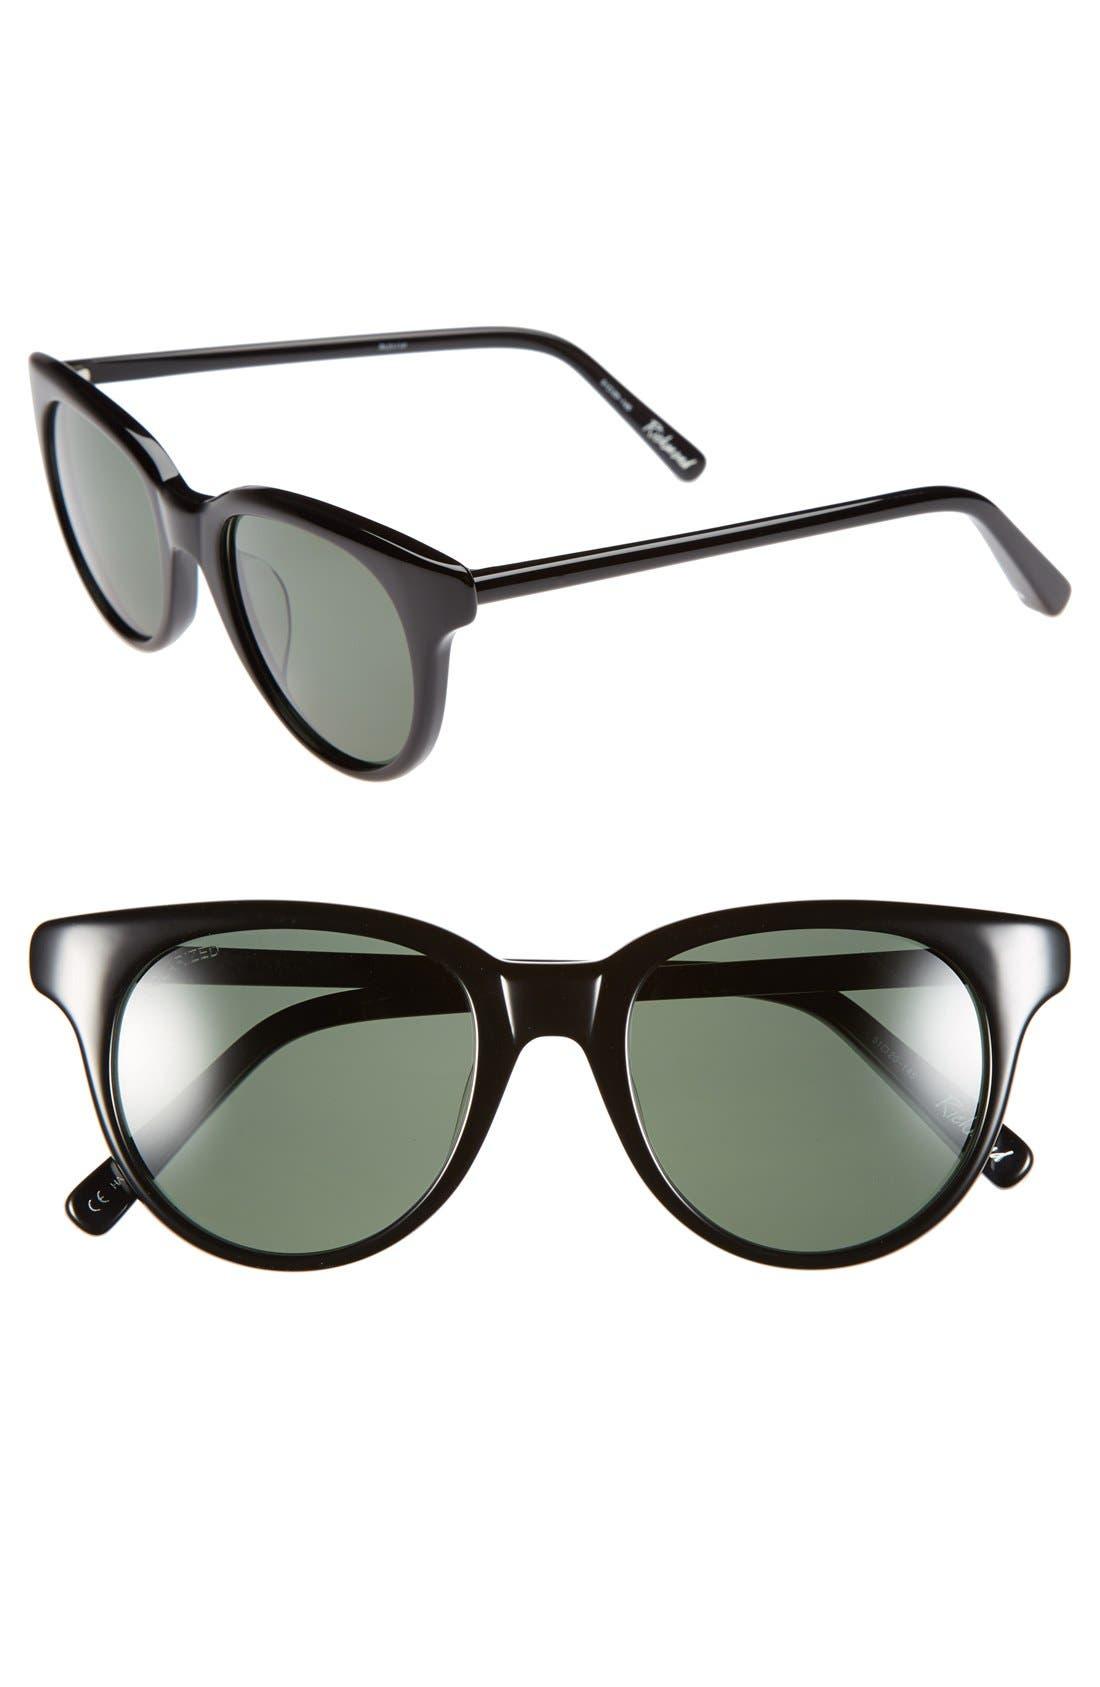 Main Image - Elizabeth and James 'Richmond' 51mm Polarized Sunglasses